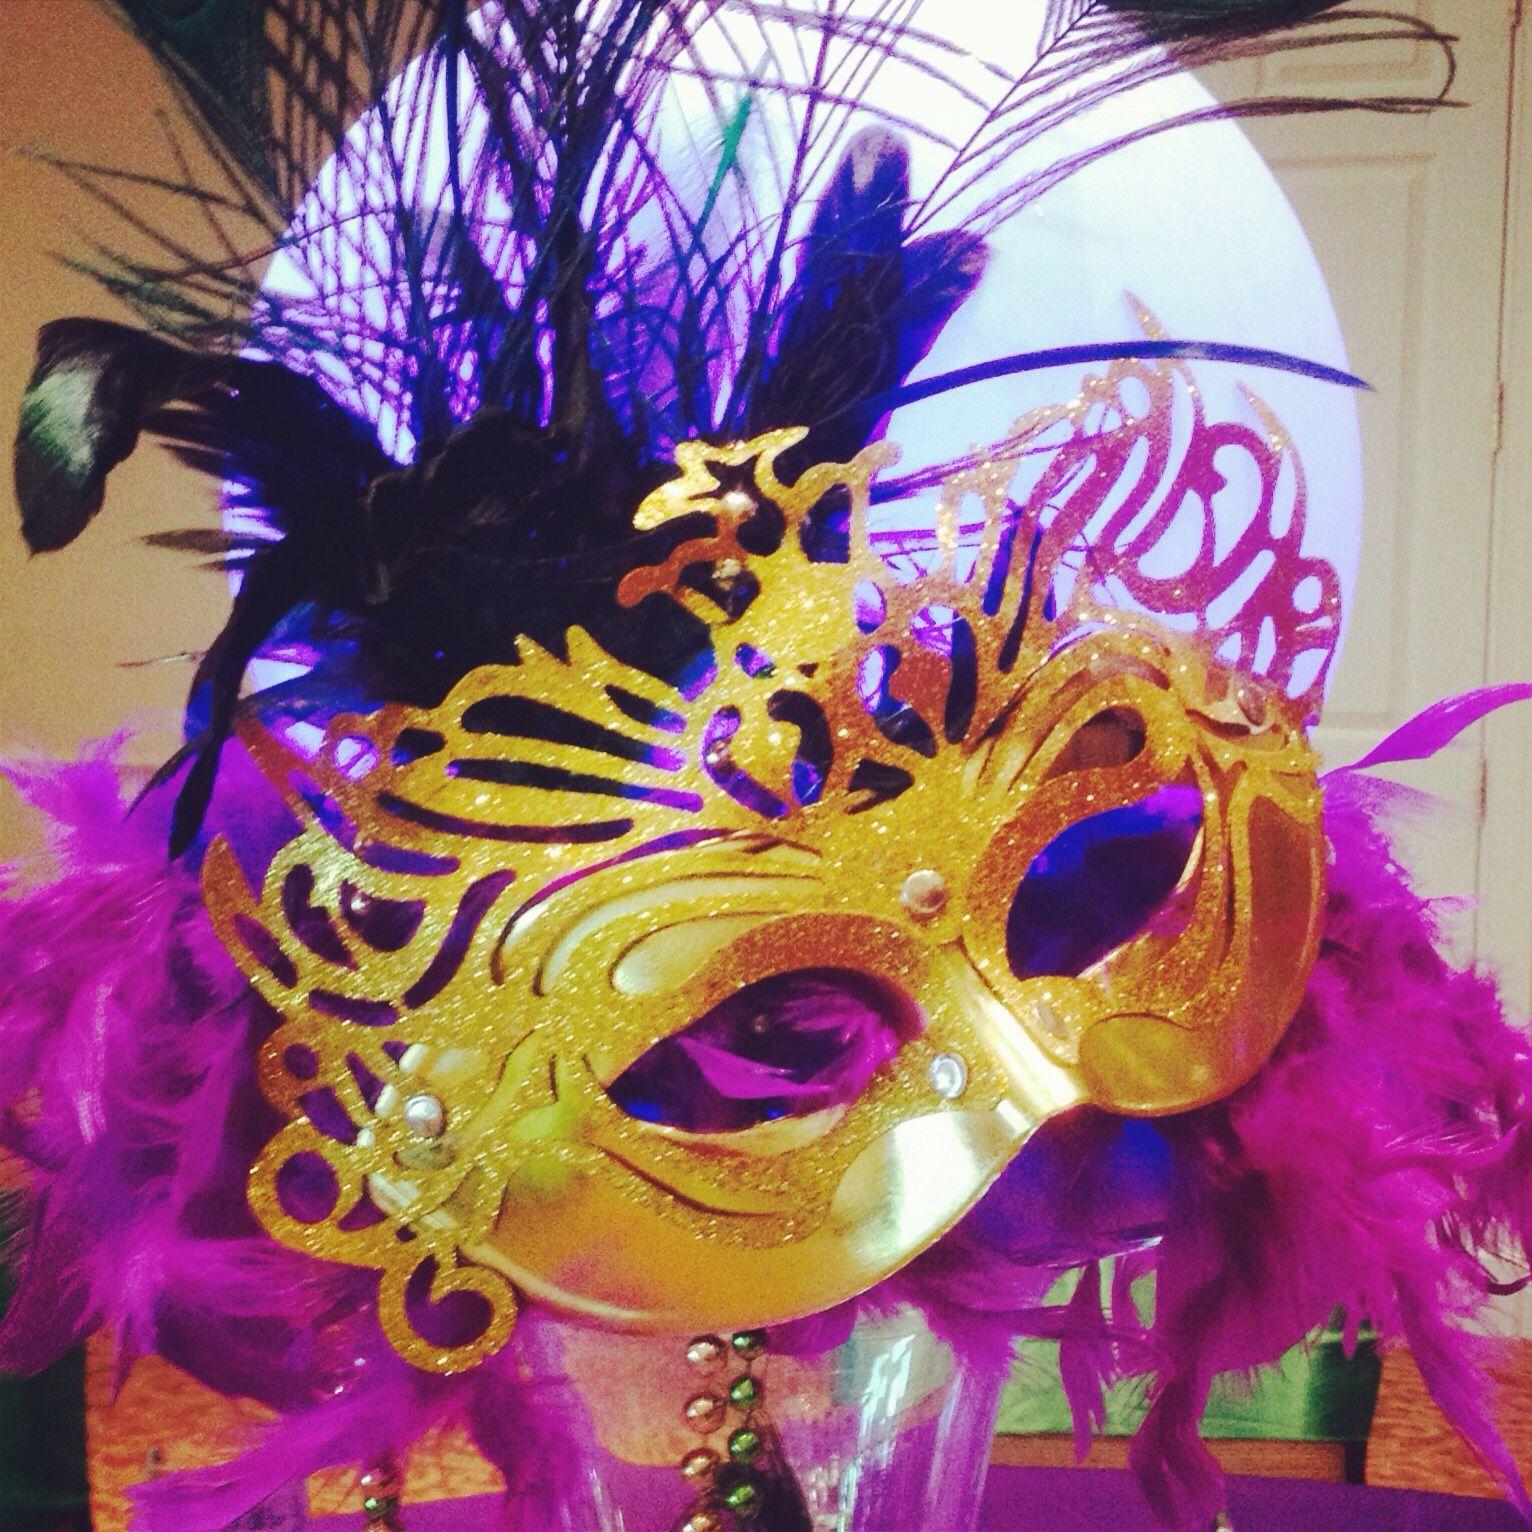 Mardi Gras Wedding Ideas: Mardi Gras Themed Party By Elegant Events Party Rentals